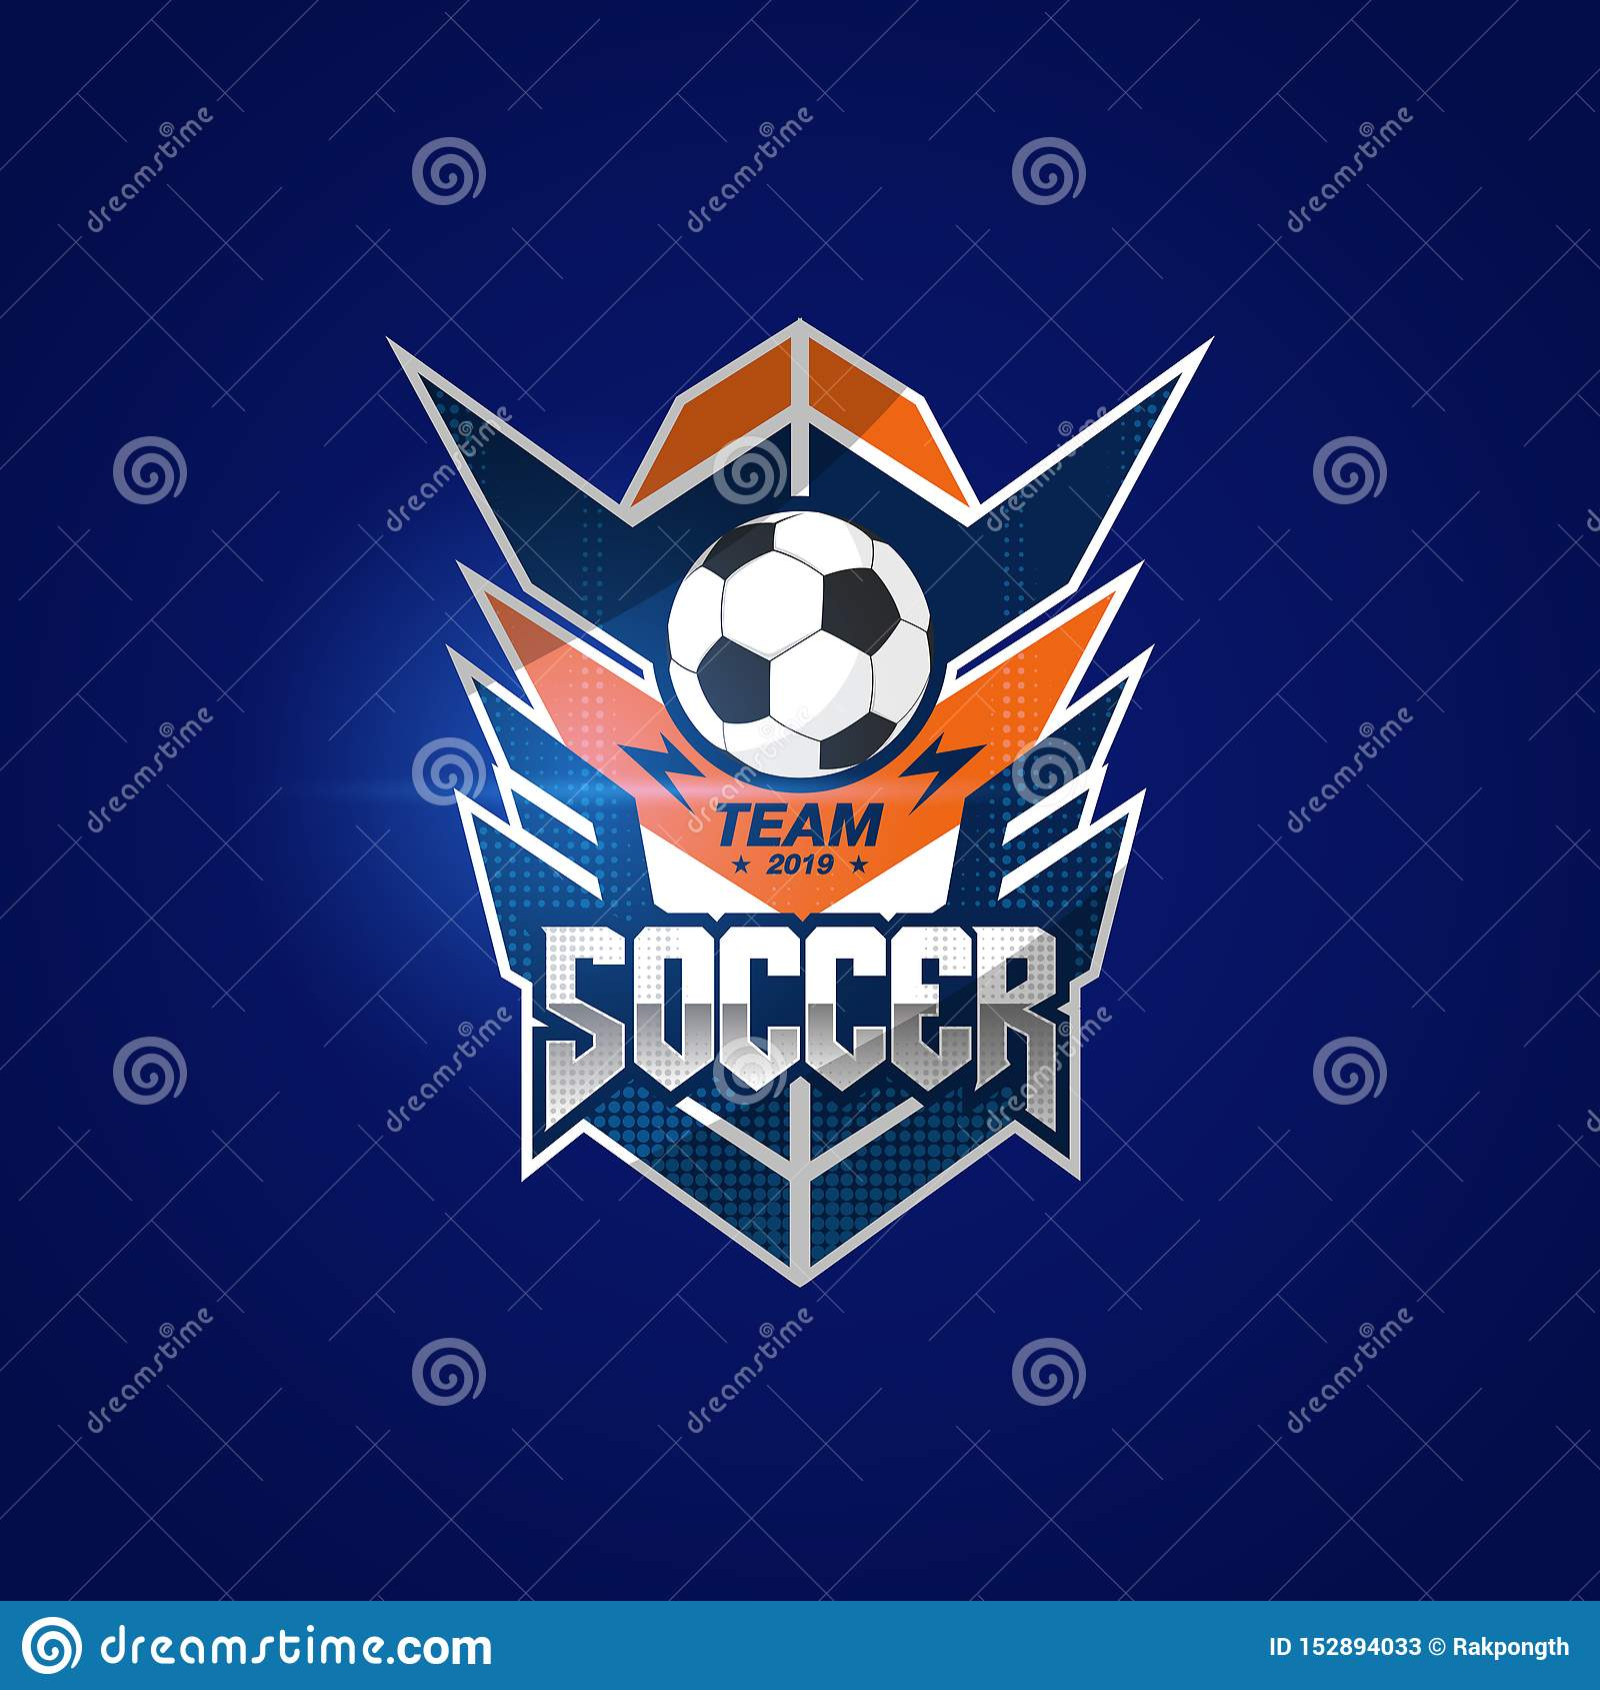 Insignia Logo Design Templates del f?tbol del f?tbol | Deporte Team Identity Vector Illustrations aislado en fondo azul